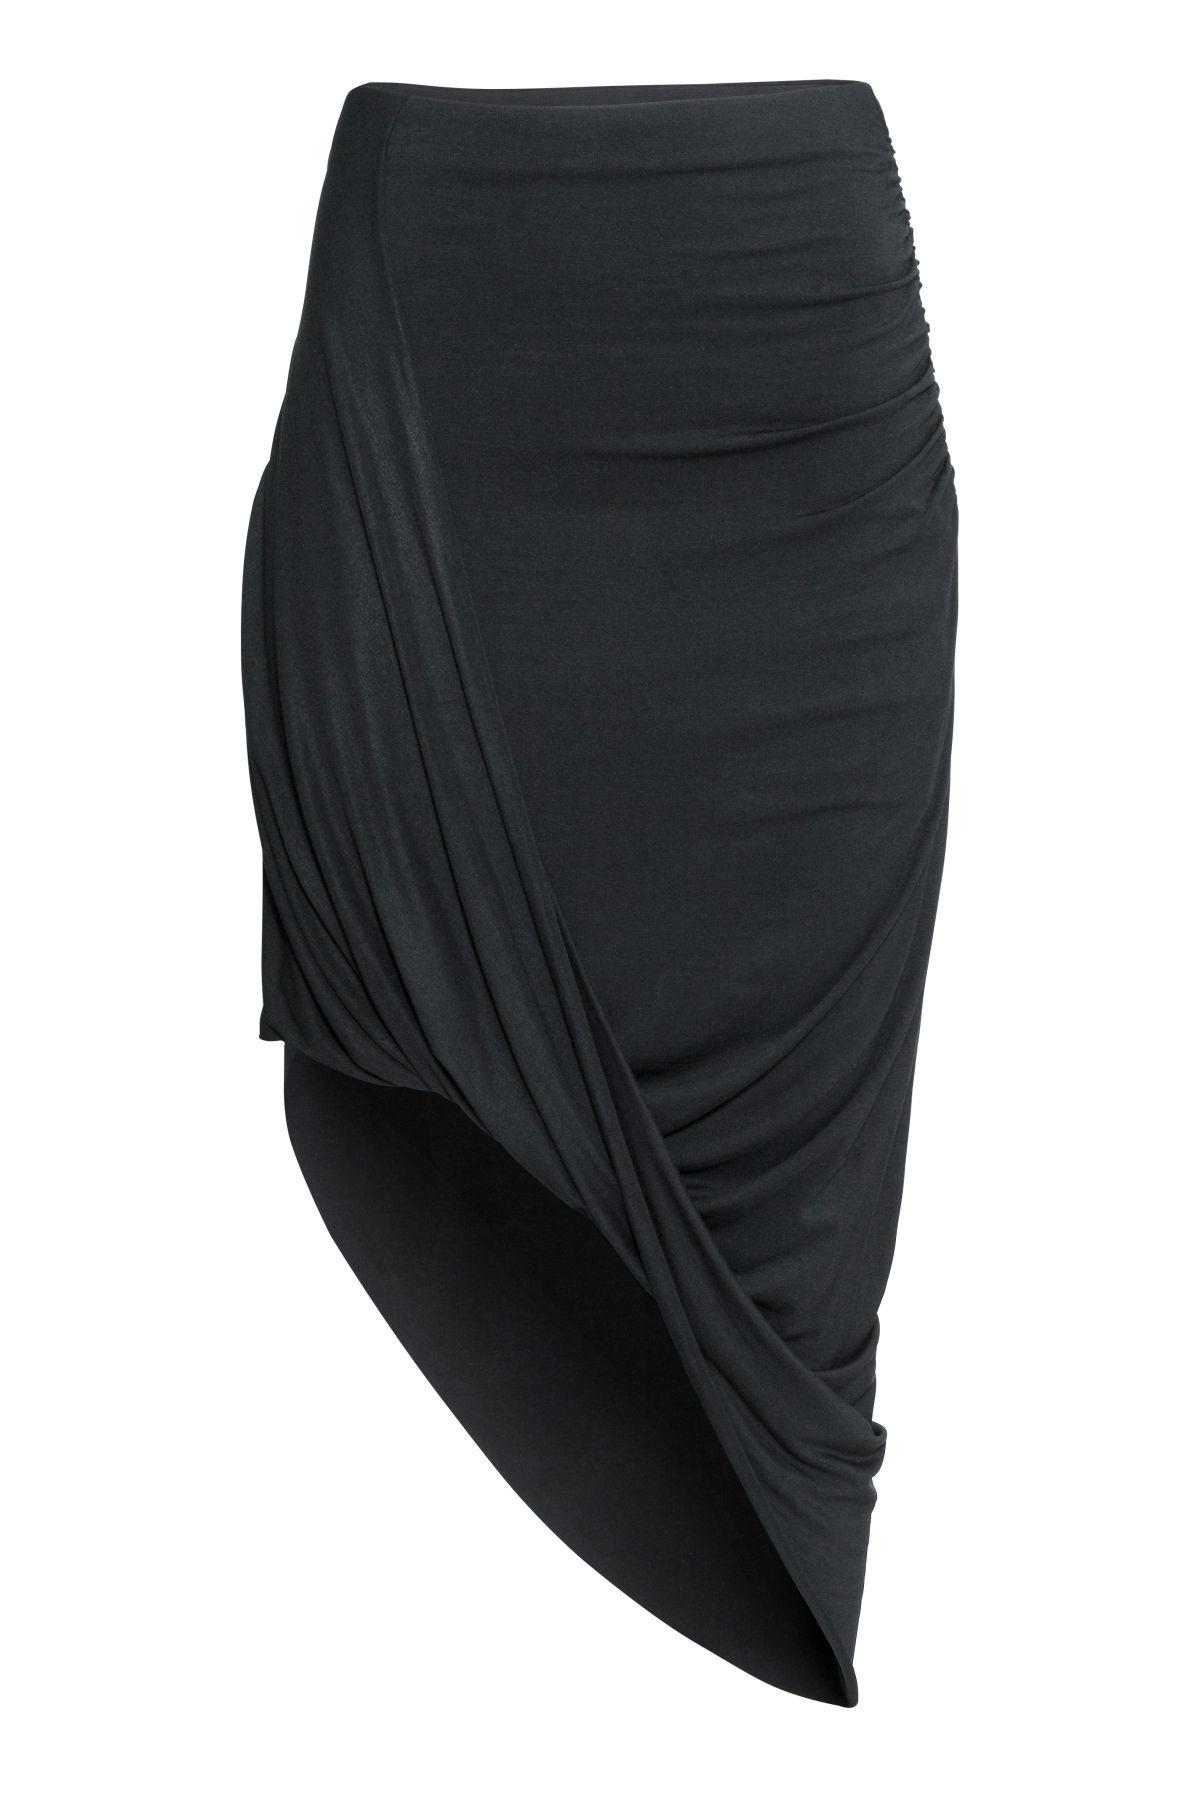 drape b masaba skirt off draped drapes shoulder top designers set and